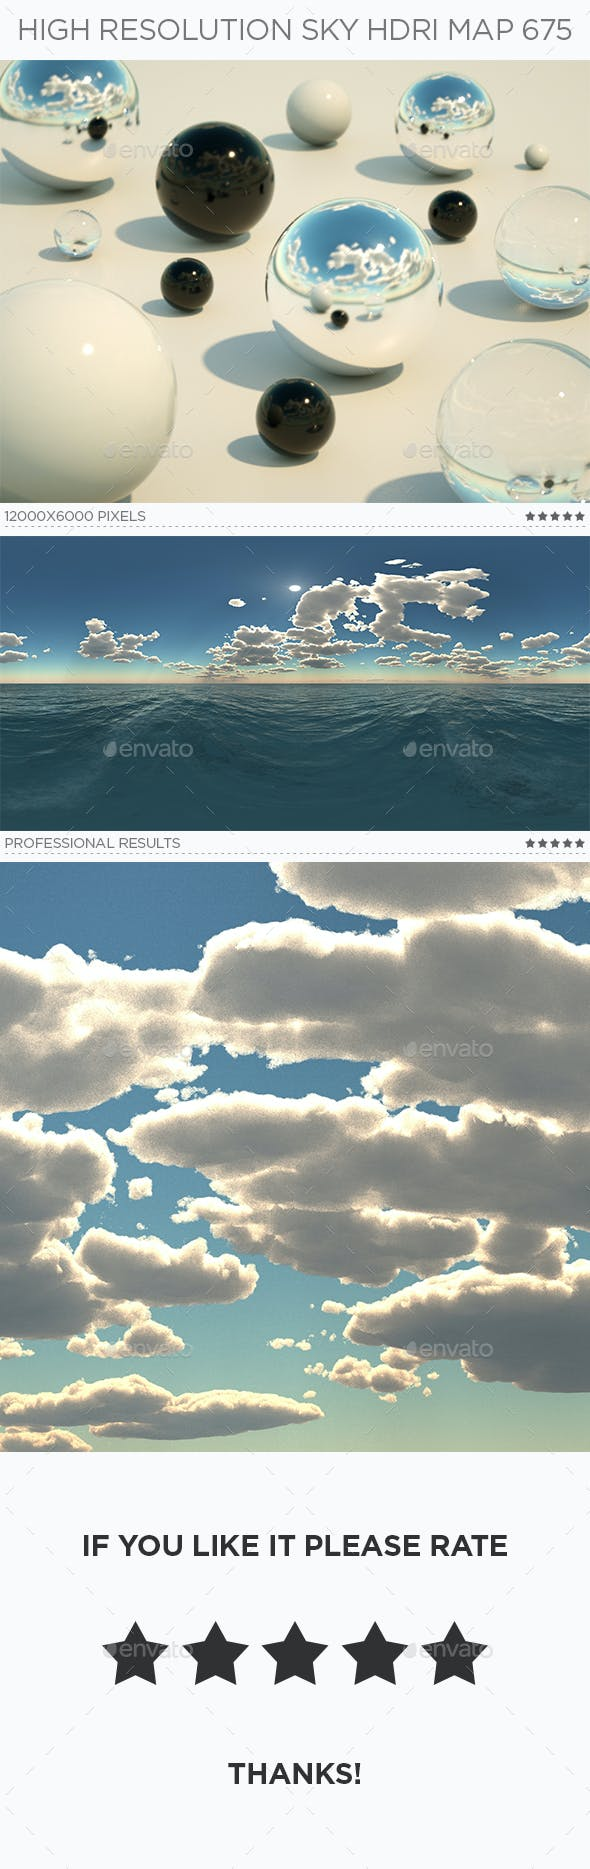 High Resolution Sky HDRi Map 675 - 3DOcean Item for Sale